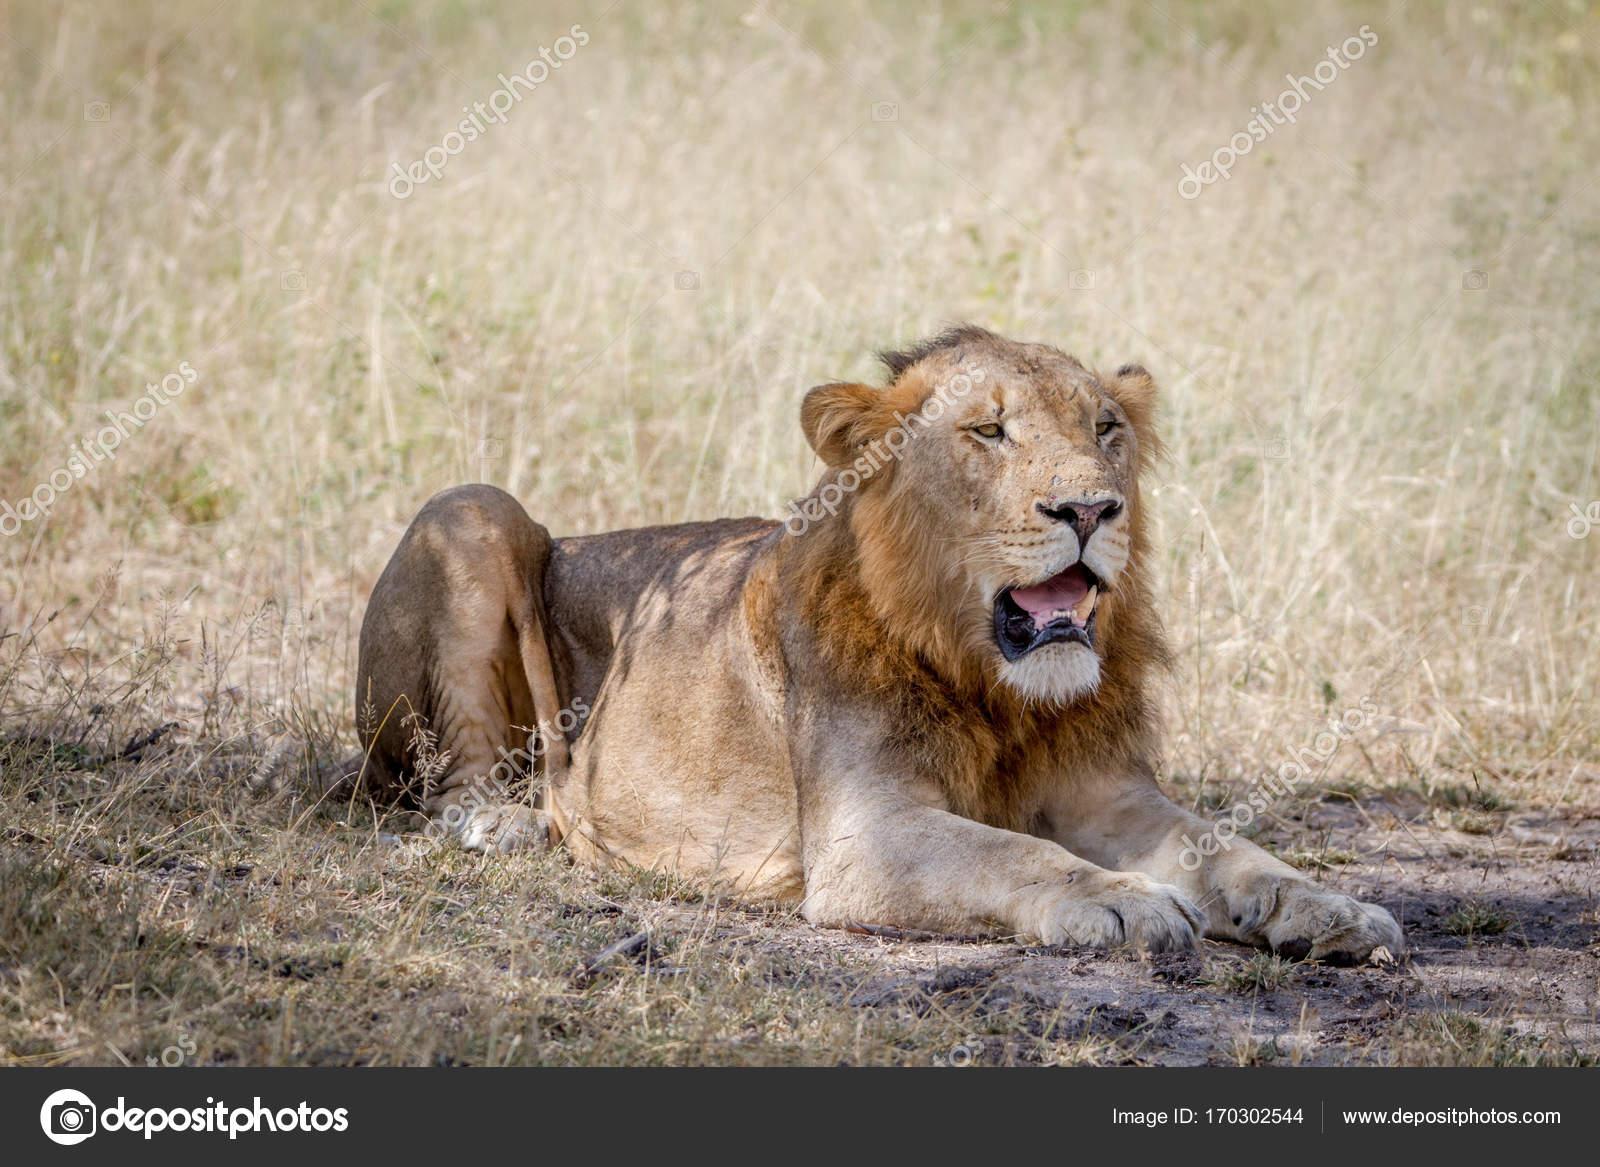 Male Lion Lying Down